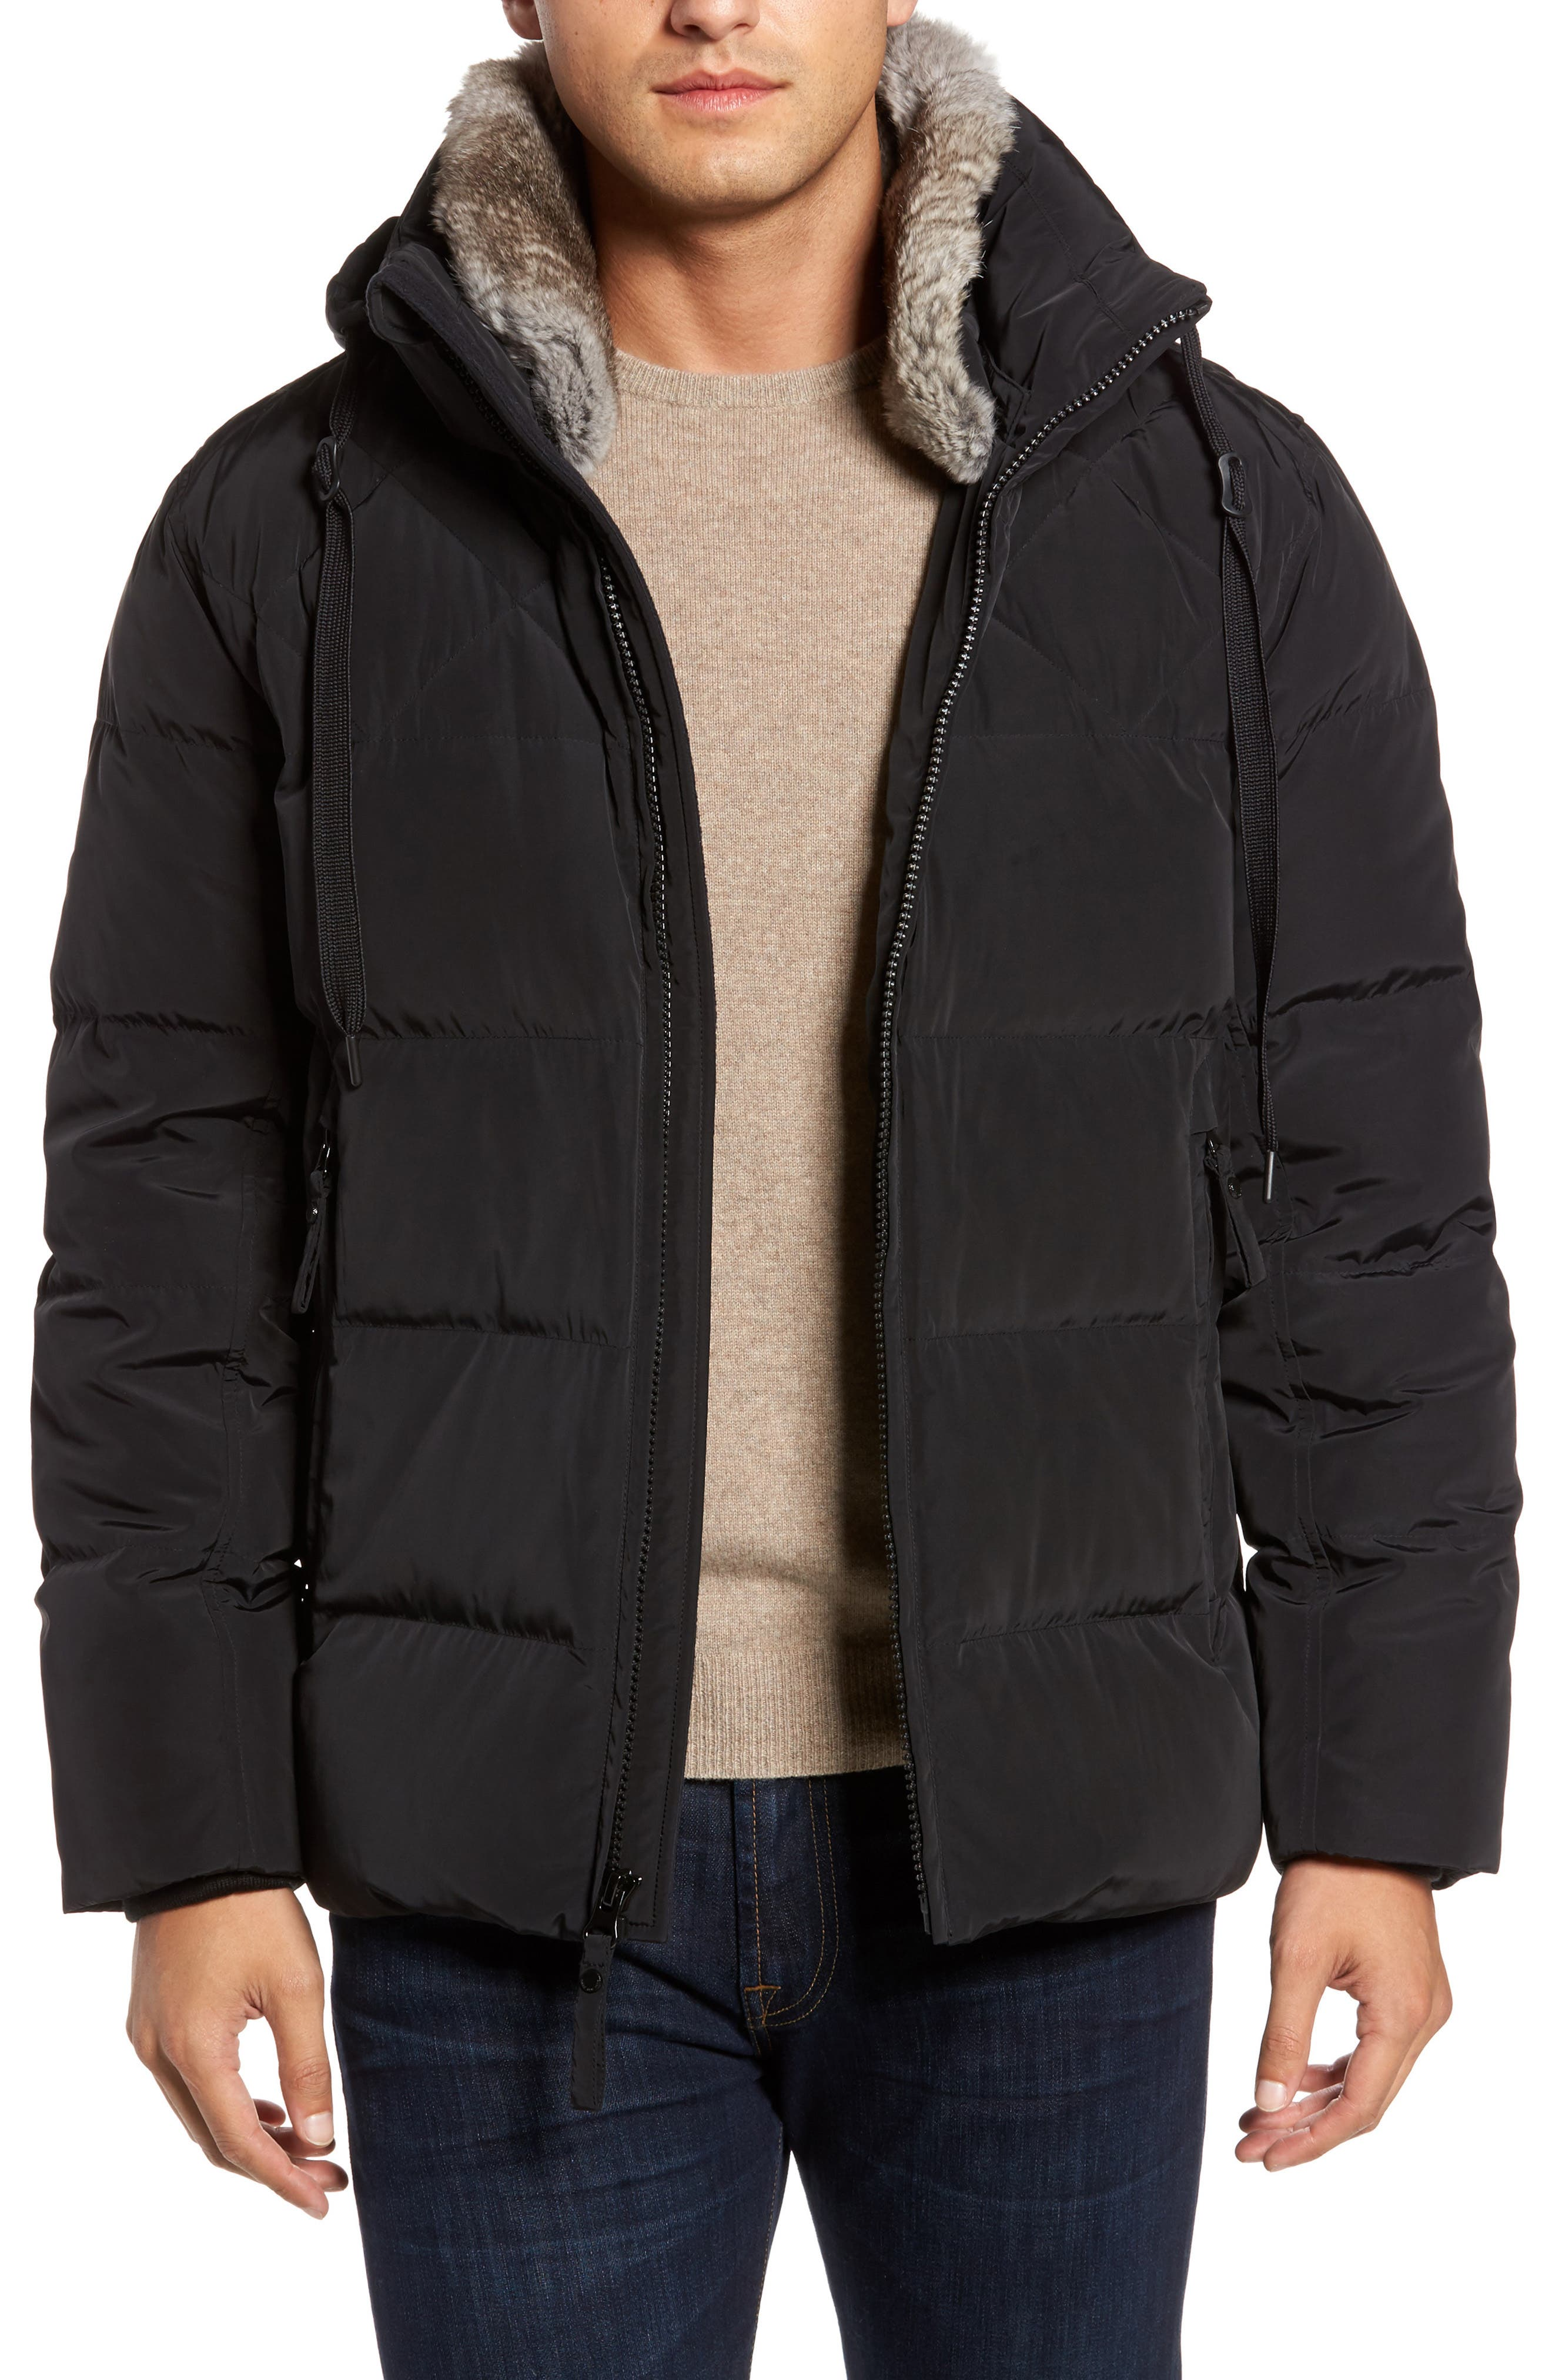 Main Image - Marc New York Navan Quilted Down Jacket with Genuine Rabbit Fur Trim